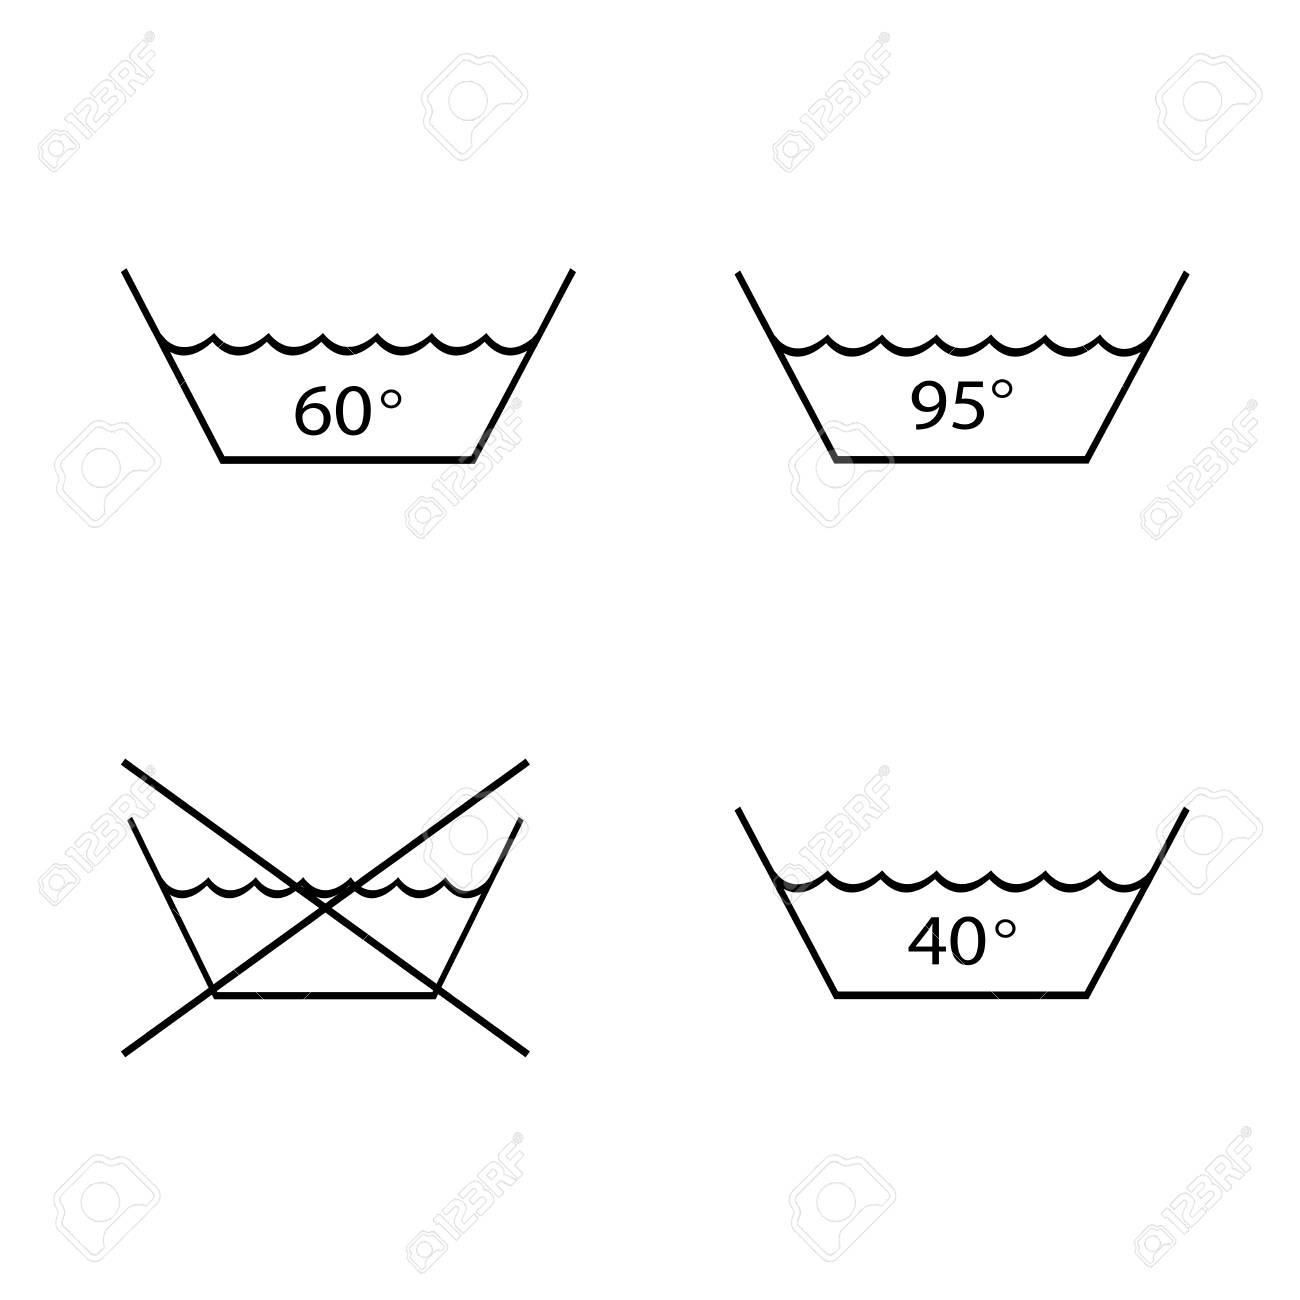 hight resolution of foto de archivo warning mark care for washing and boil textile tissue garment set symbol sign for label vector illustration